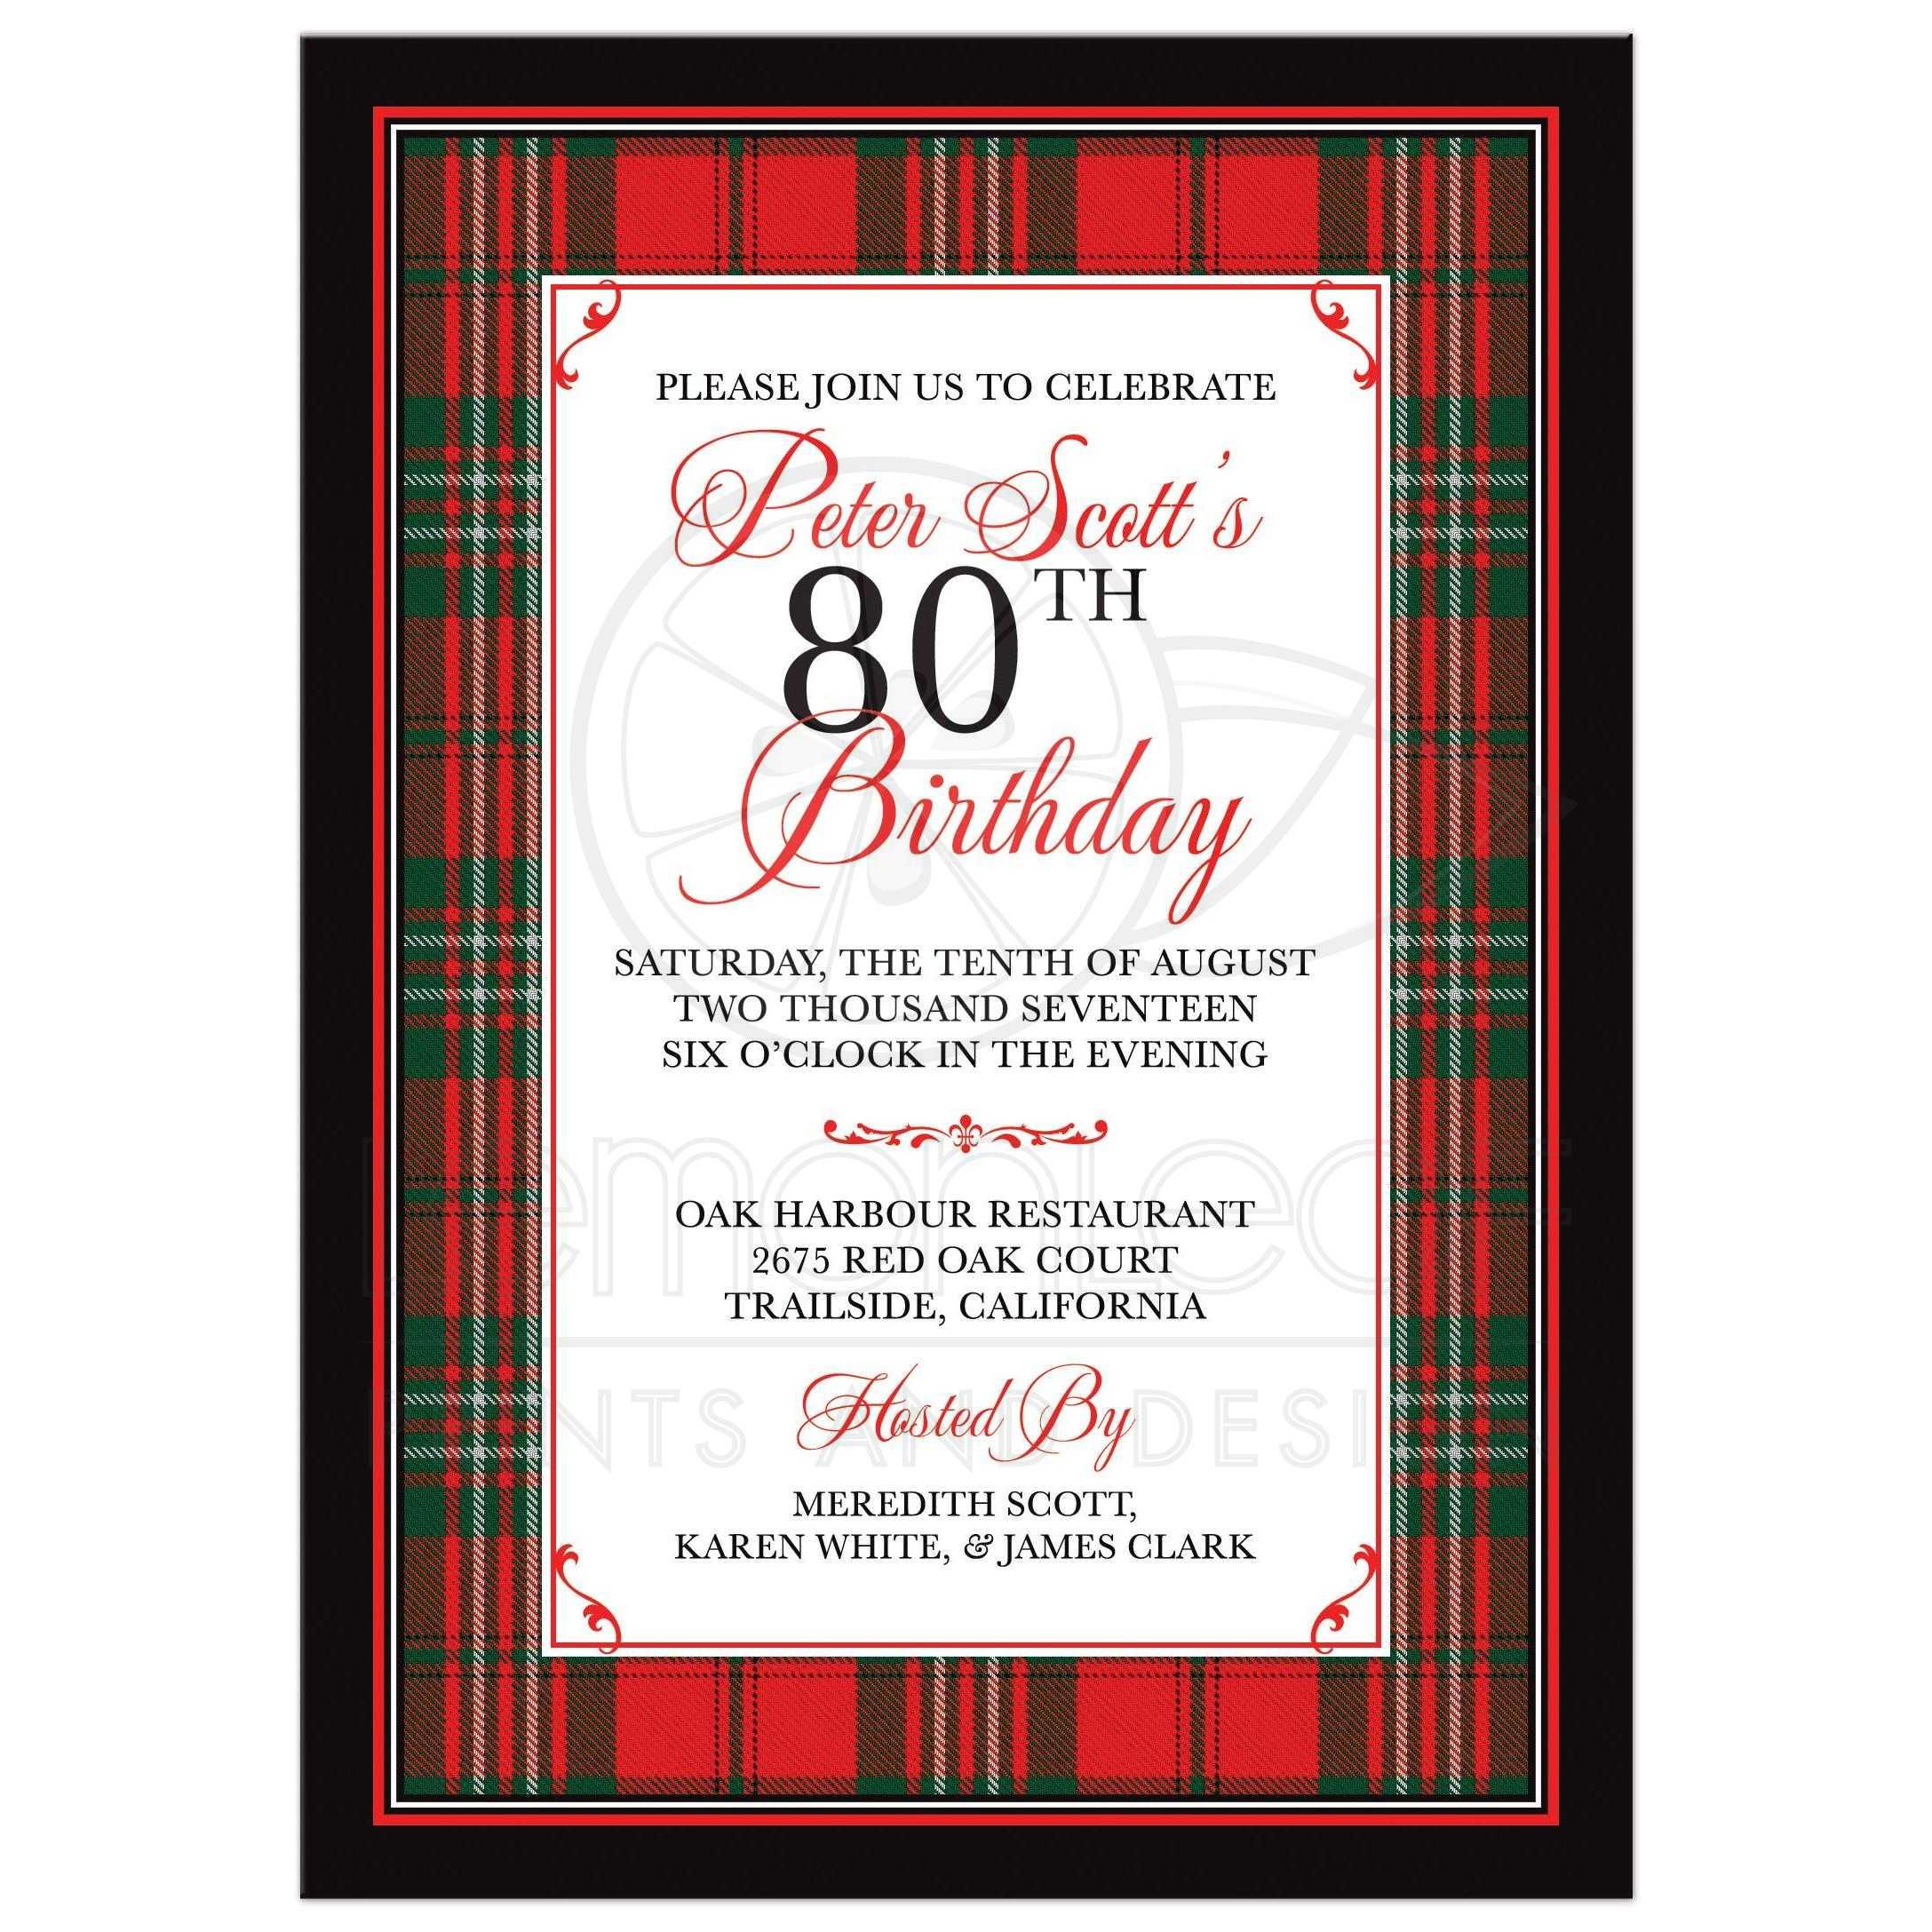 Best Scottish Clan Scott Tartan Birthday Invitation Front Scottish Clan Scott Tartan Birthday Invitation 80th Birthday Invitations Australia 80th Birthday Invitations Ebay invitations 80th Birthday Invitations